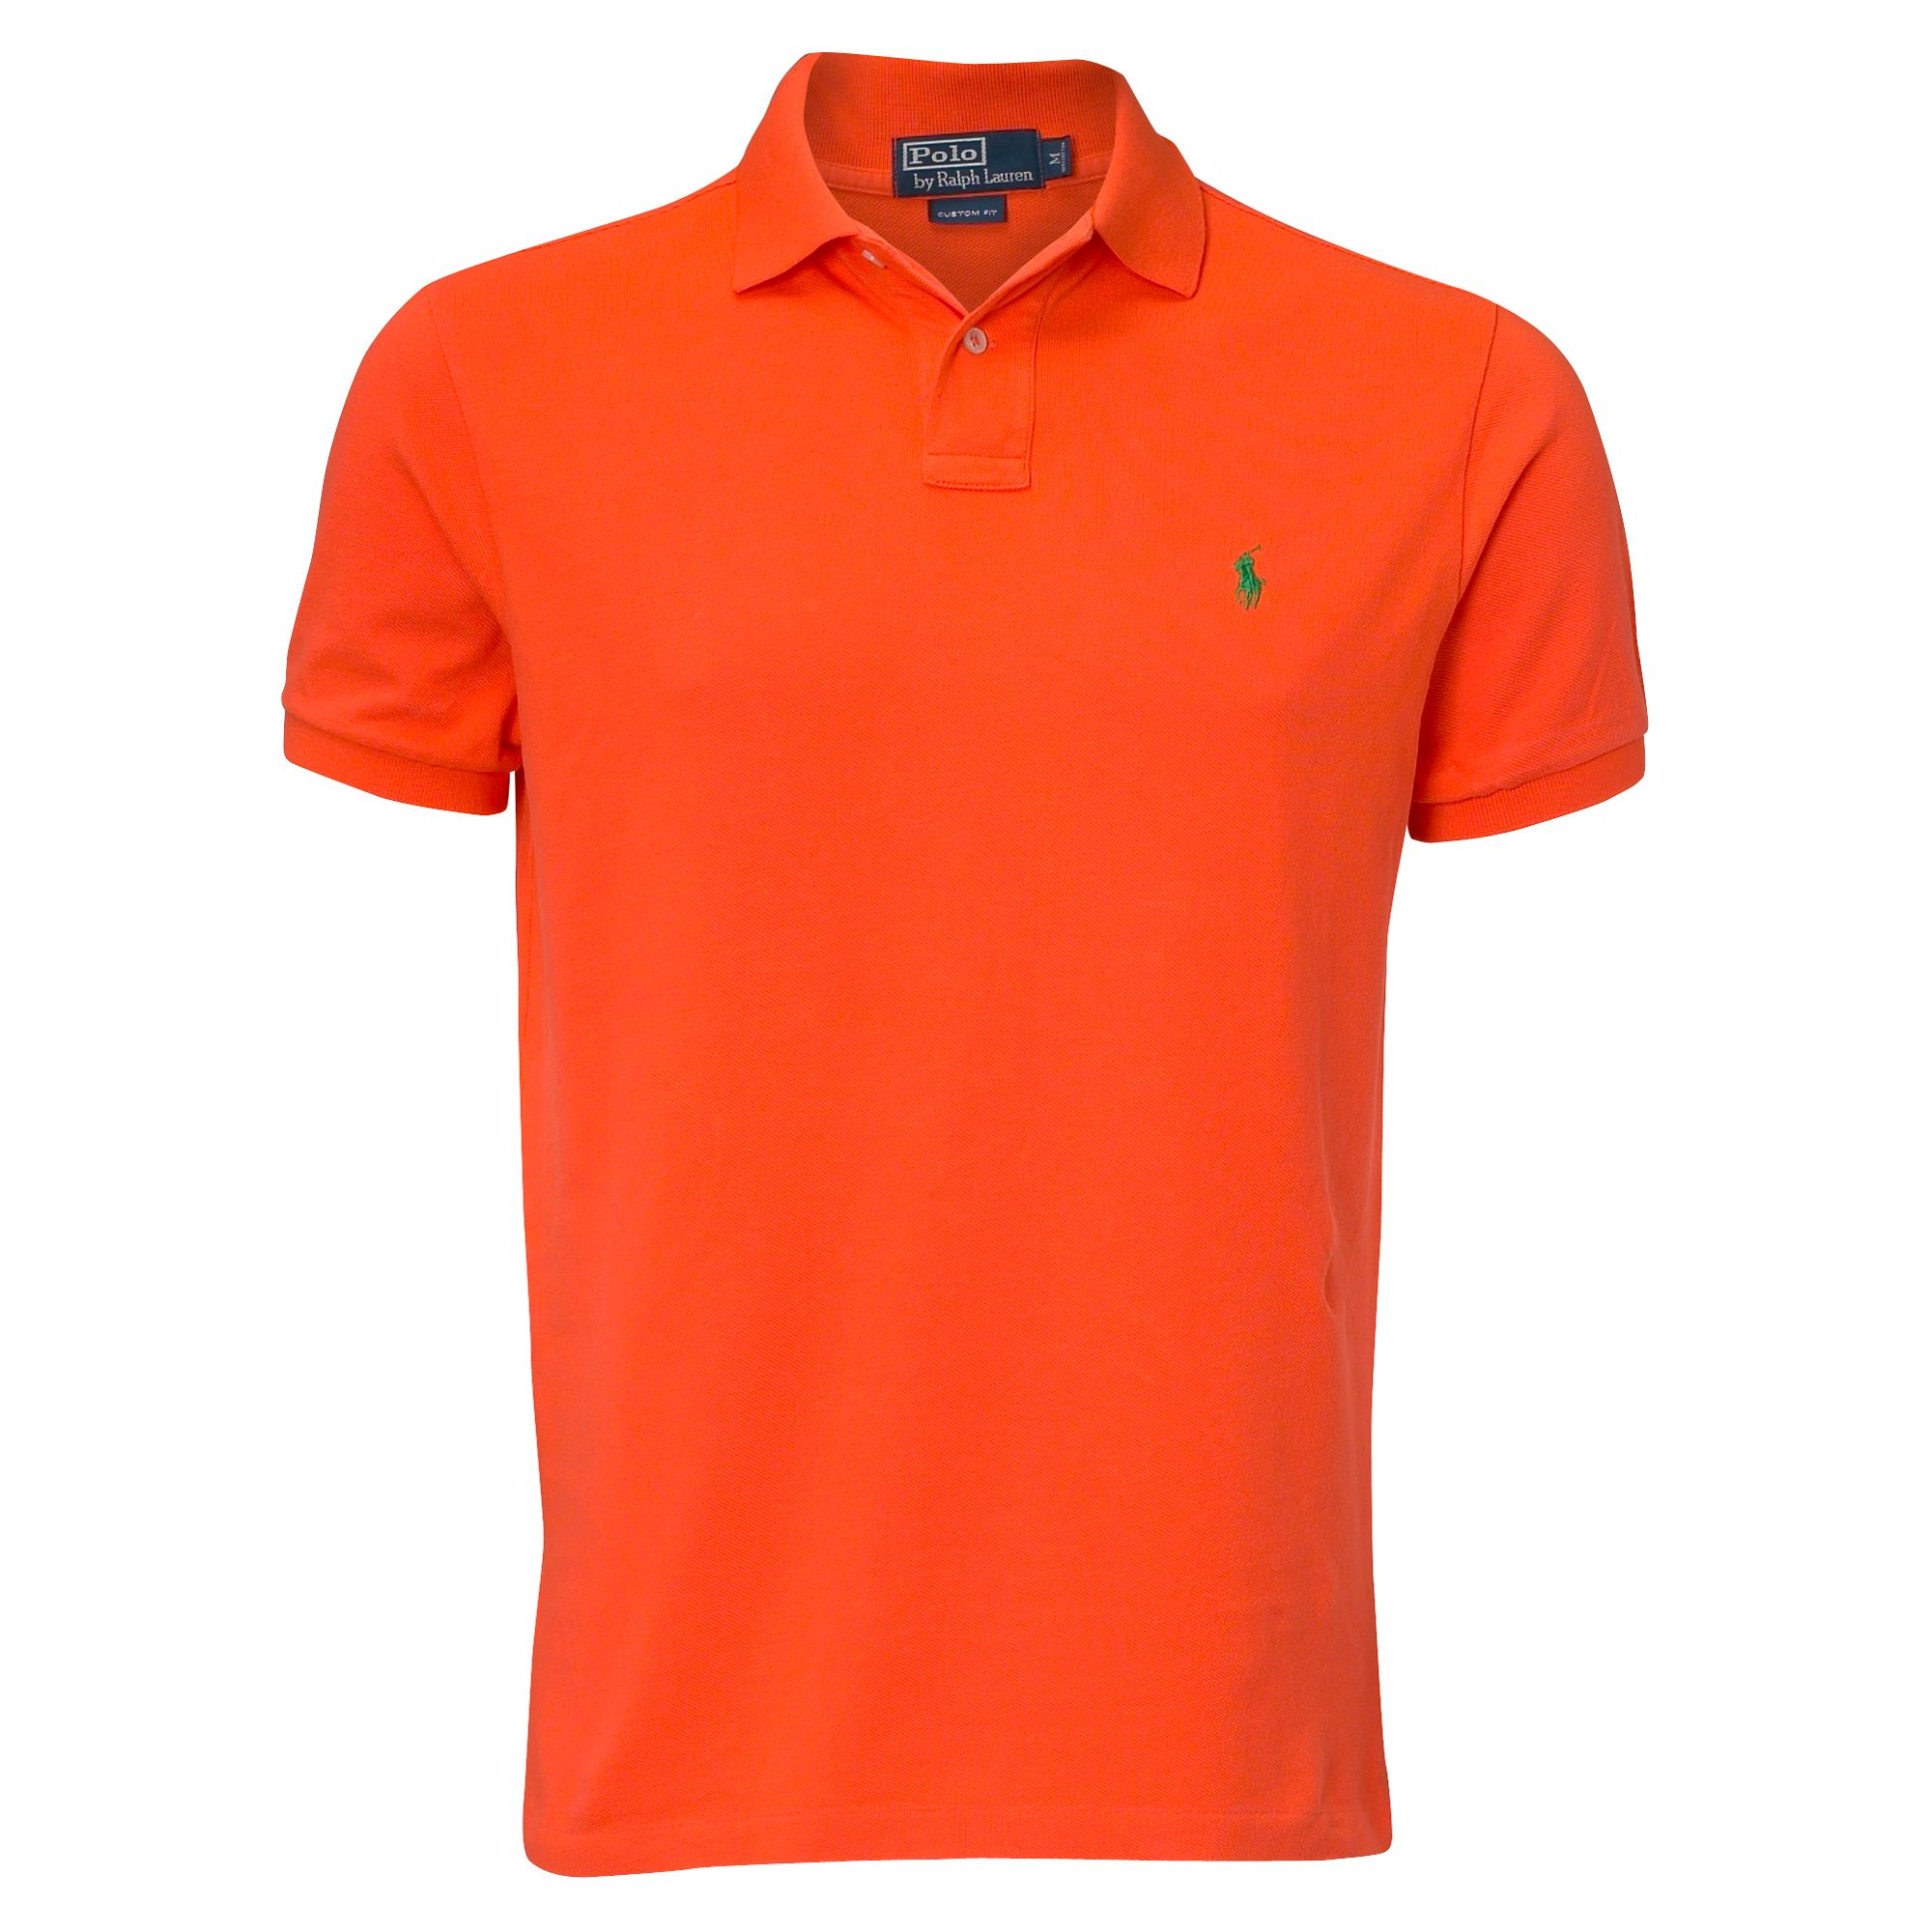 Polo ralph lauren custom fit mesh polo shirt in orange for for Custom design polo shirts